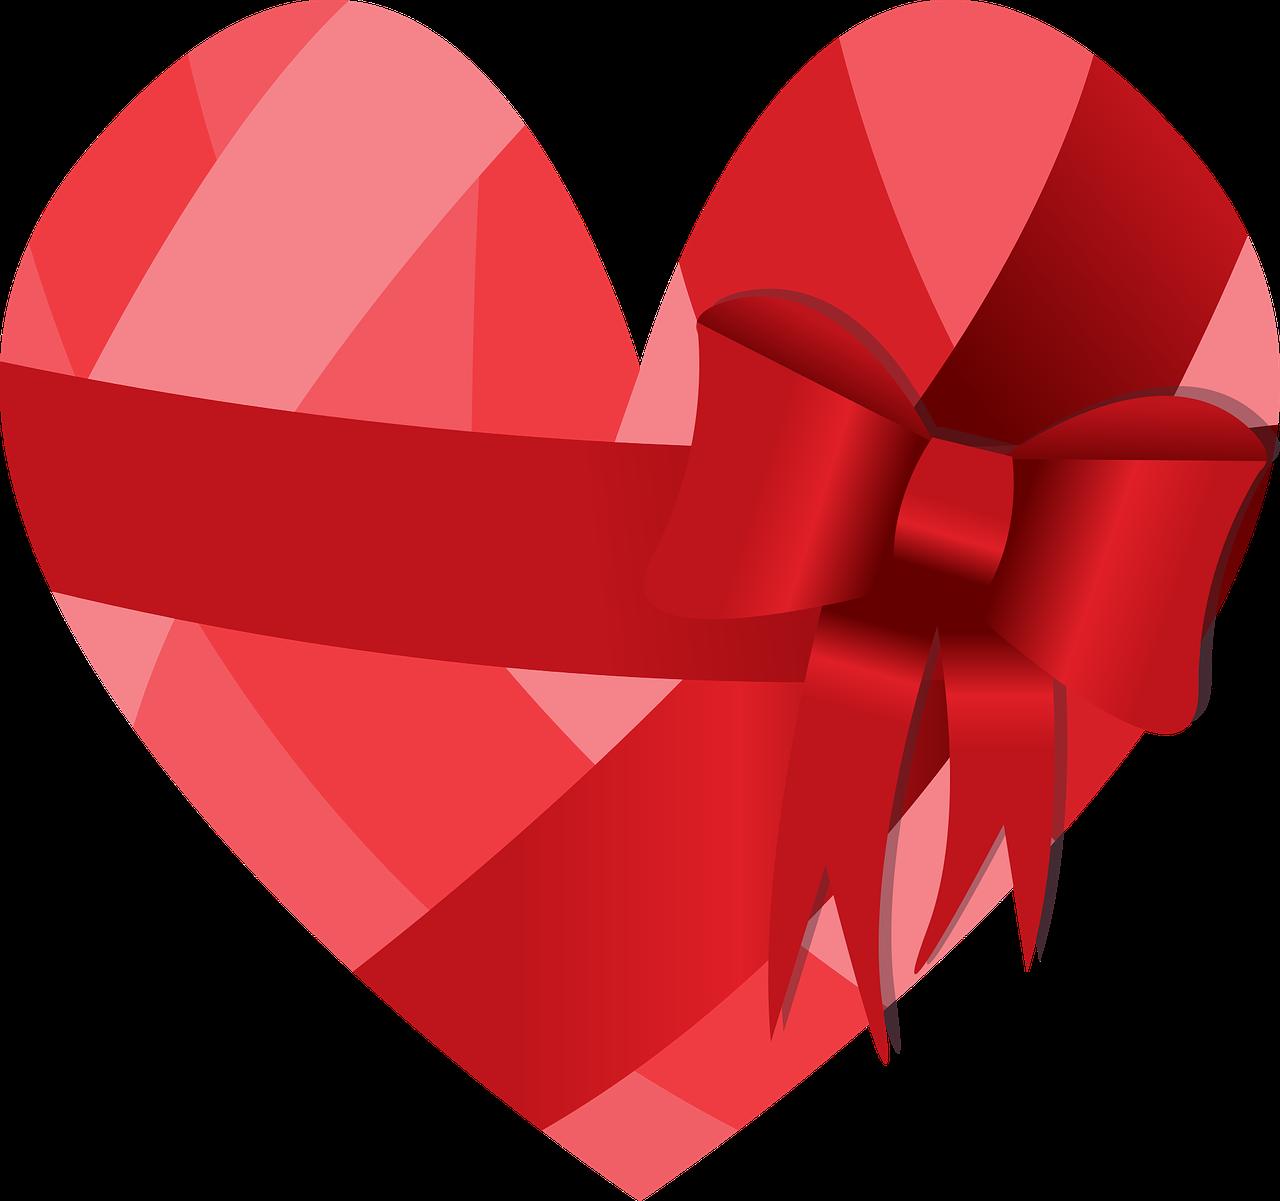 картинка сердце с бантиком знаки руках теле